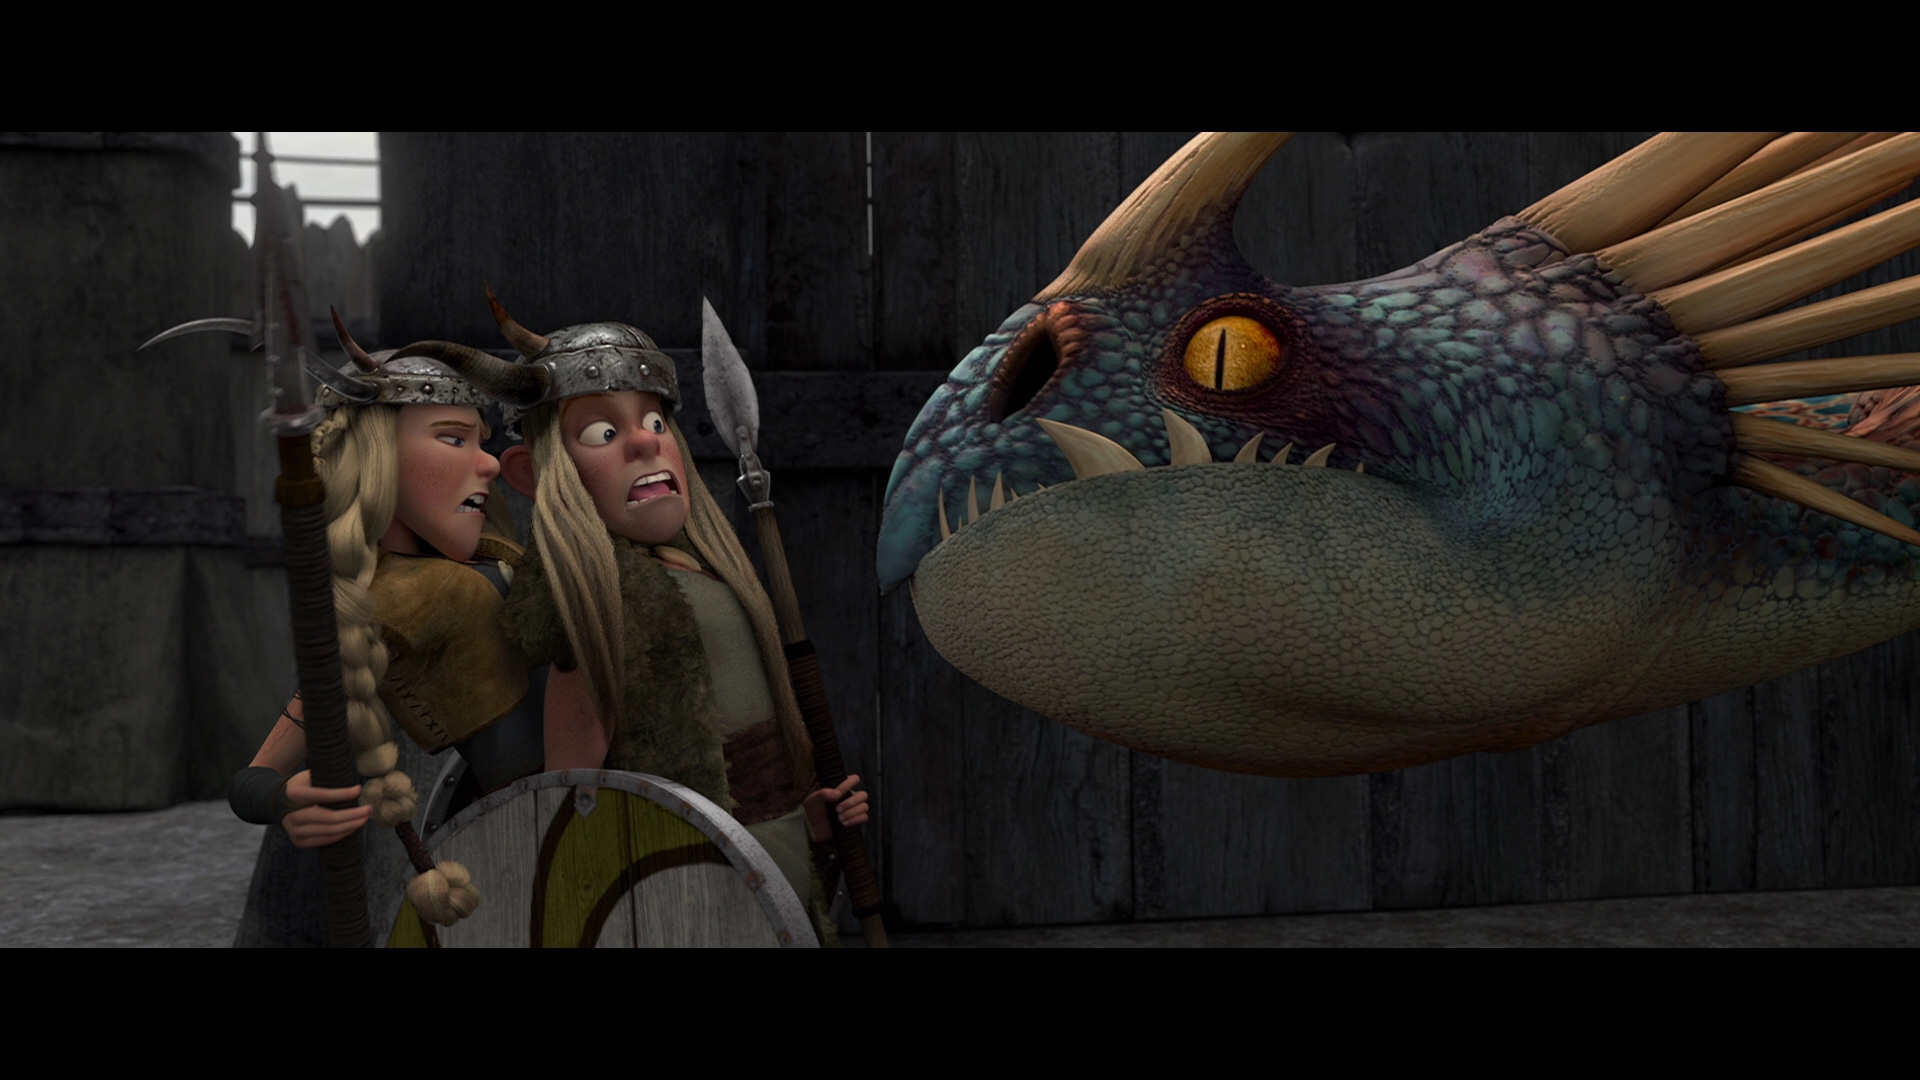 http://www.gamesfun-online.de/dervideospieler_de/images/movie/howtotrainyourdragon/screens1/Untitled_14.jpg